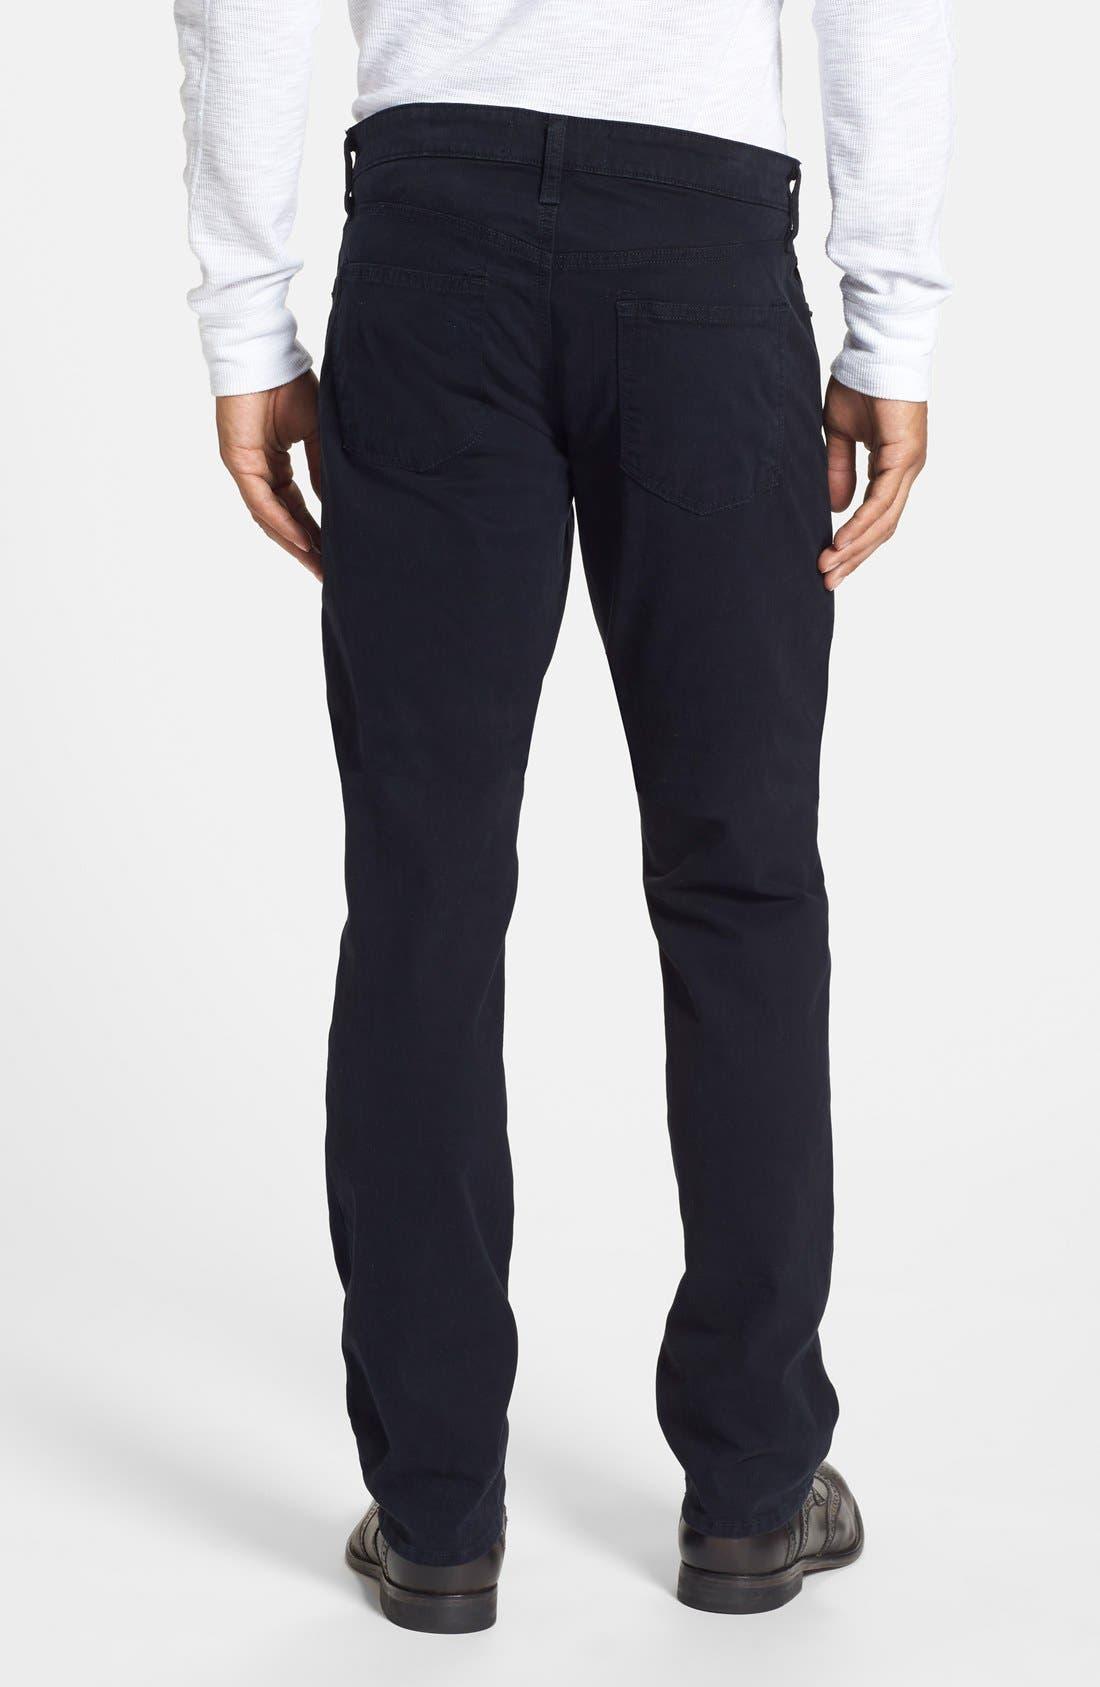 'Kane' Slim Fit Cotton Twill Pants,                             Alternate thumbnail 68, color,